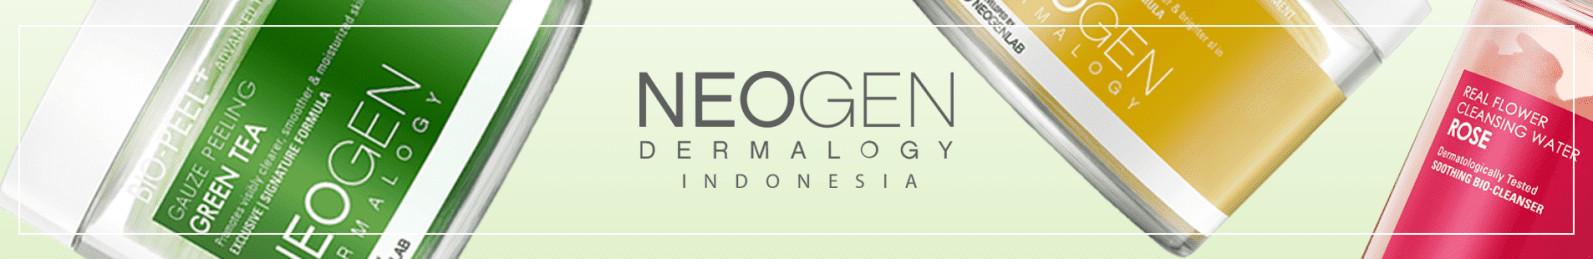 NeogenDermalogy Official